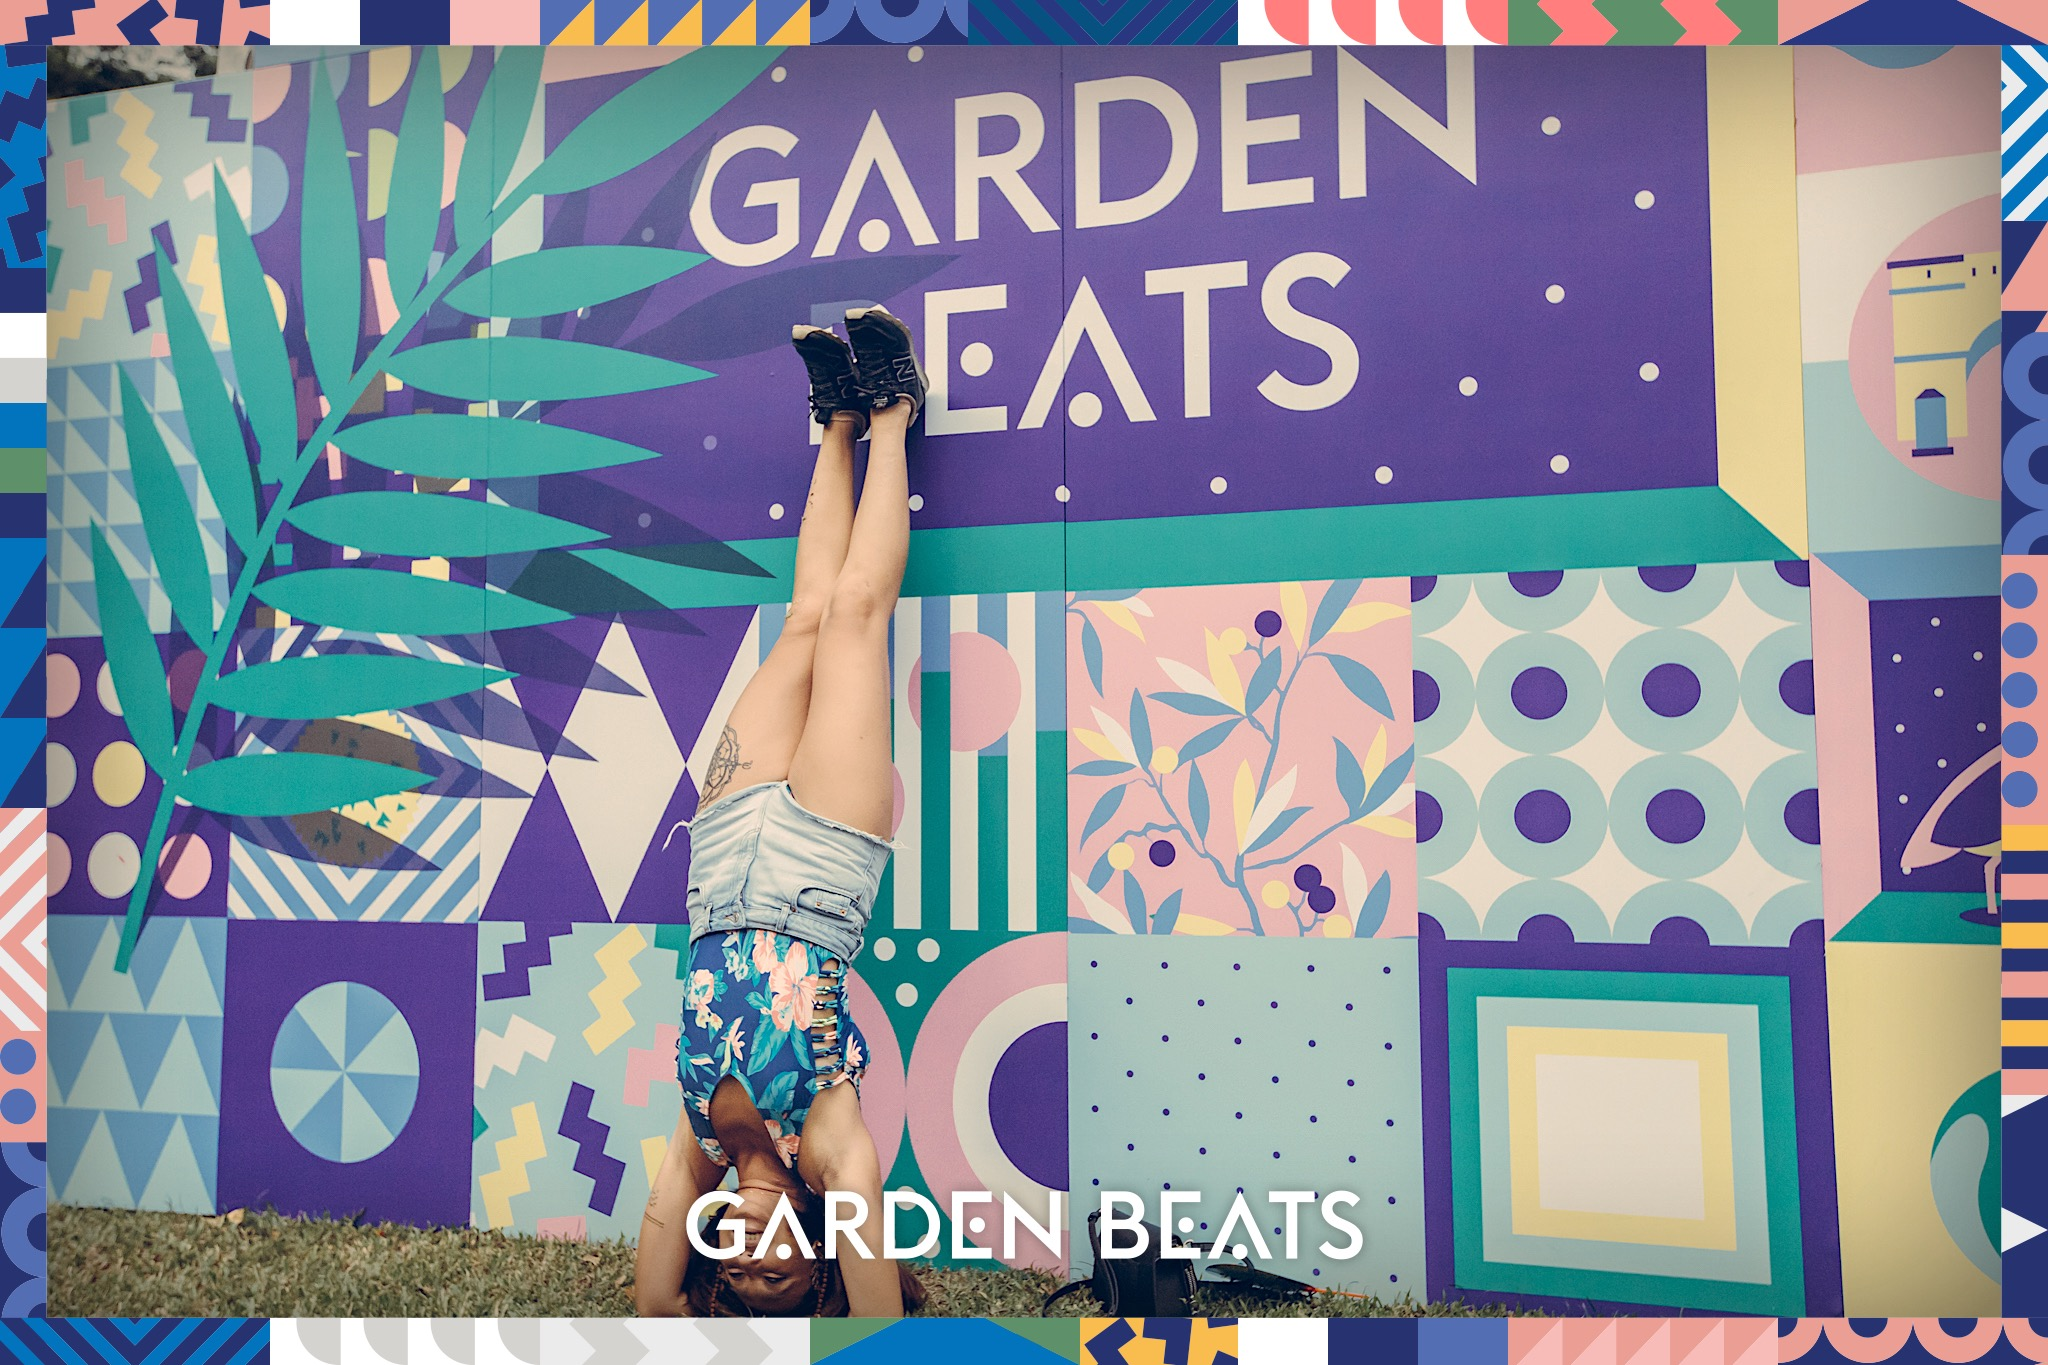 03032018_GardenBeats_Colossal404_Watermarked.jpg